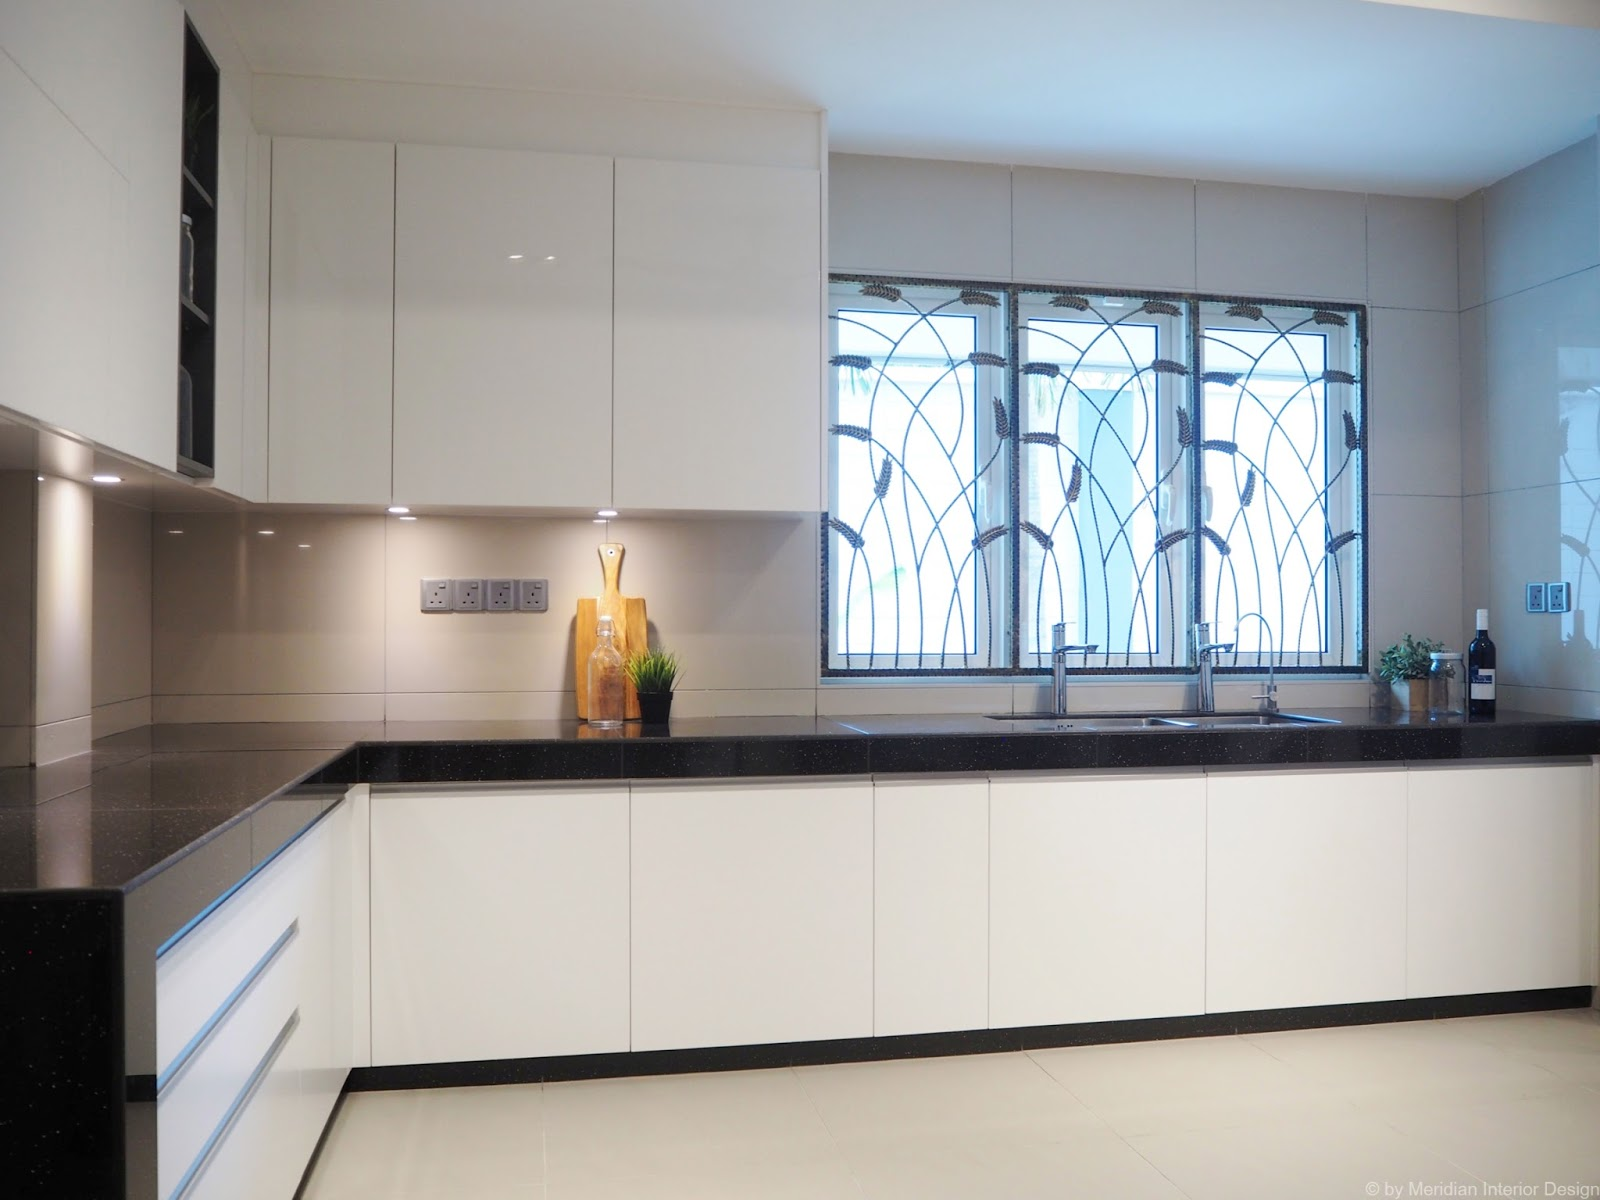 Meridian interior design and kitchen design in kuala for Brand new kitchen designs